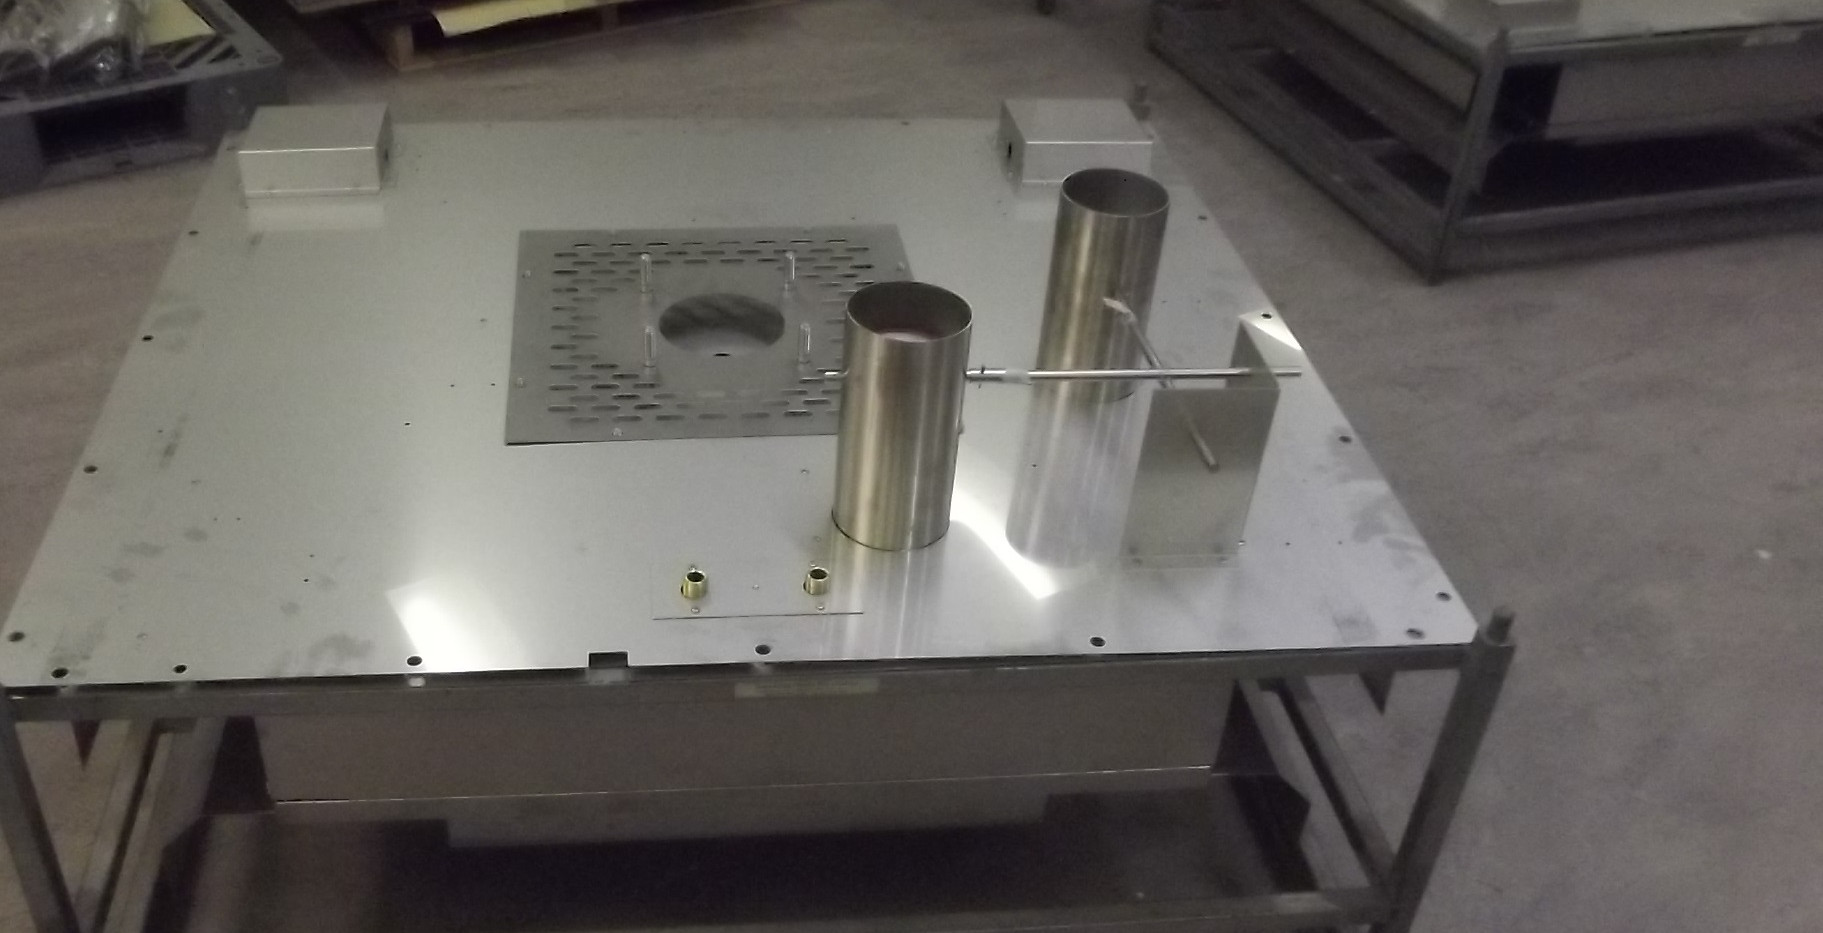 Welding Stainless Steel Ovens